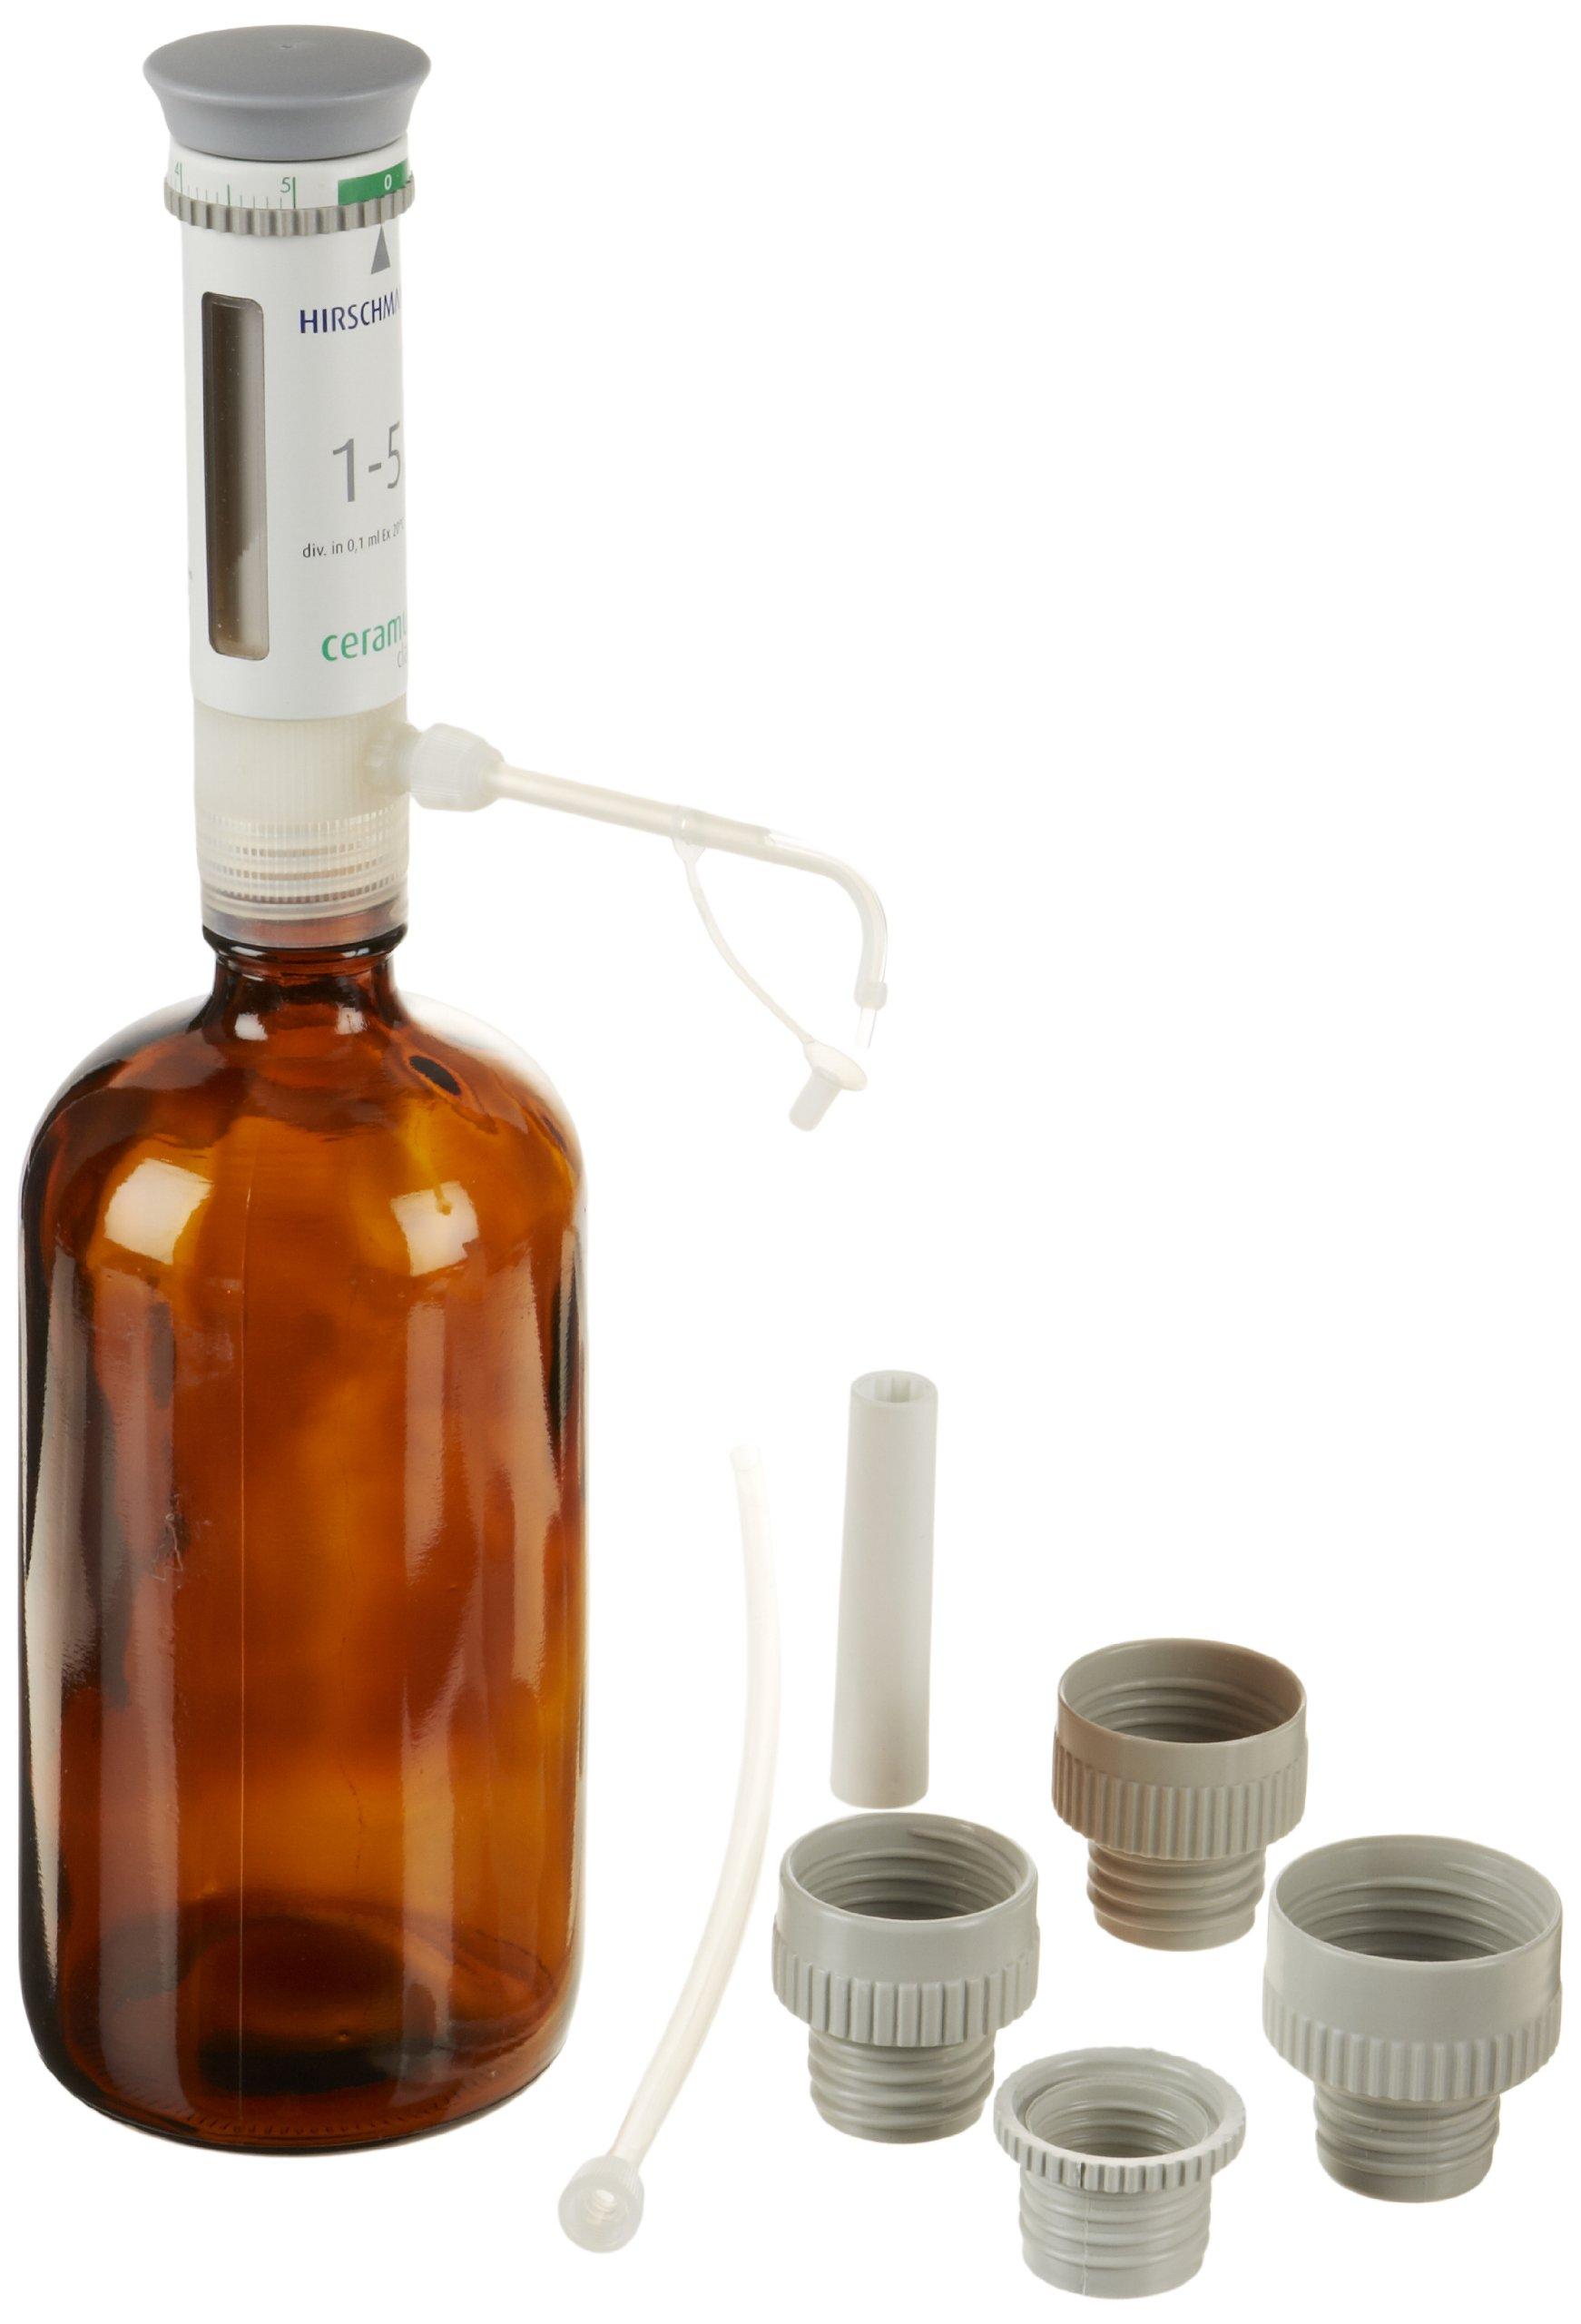 Hirschmann Ceramus Classic 933000010 Bottle Top Dispenser with Ceramic Piston and 32oz Bottle, 1-5ml Volume Range, 0.1ml Graduation